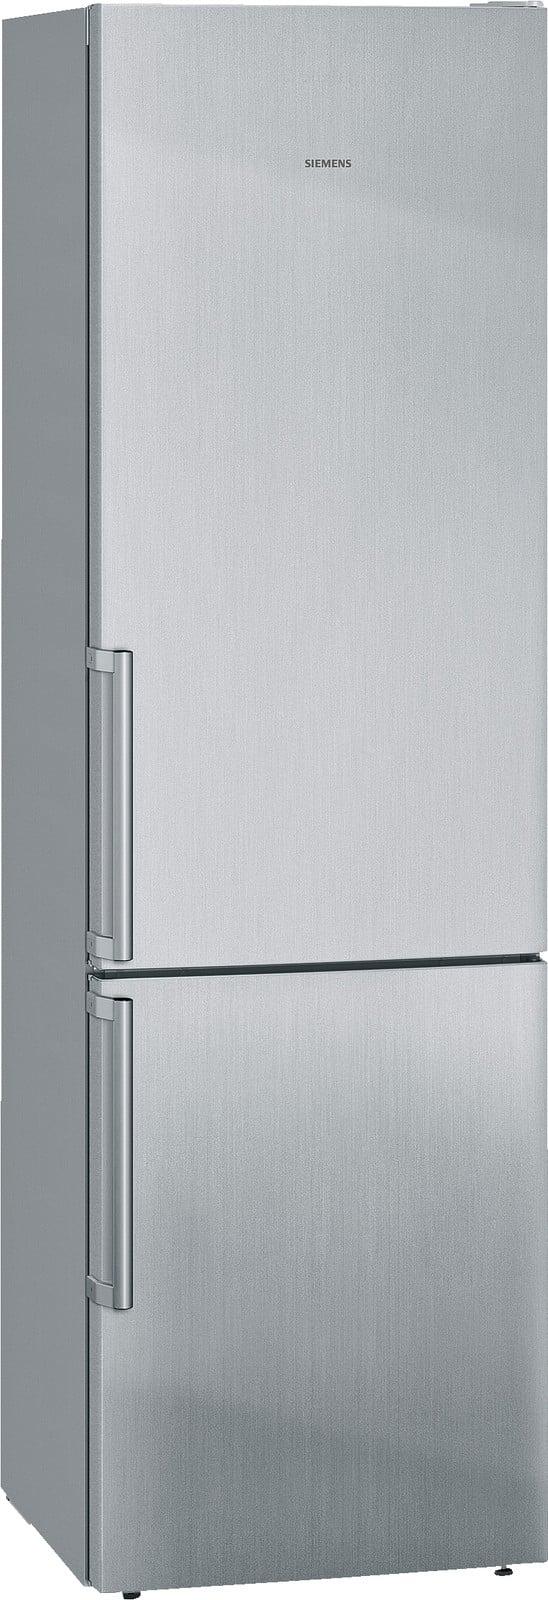 siemens kg39eai40 k hlgefrierkombination a 156 kwh 2010 mm hoch inox ebay. Black Bedroom Furniture Sets. Home Design Ideas